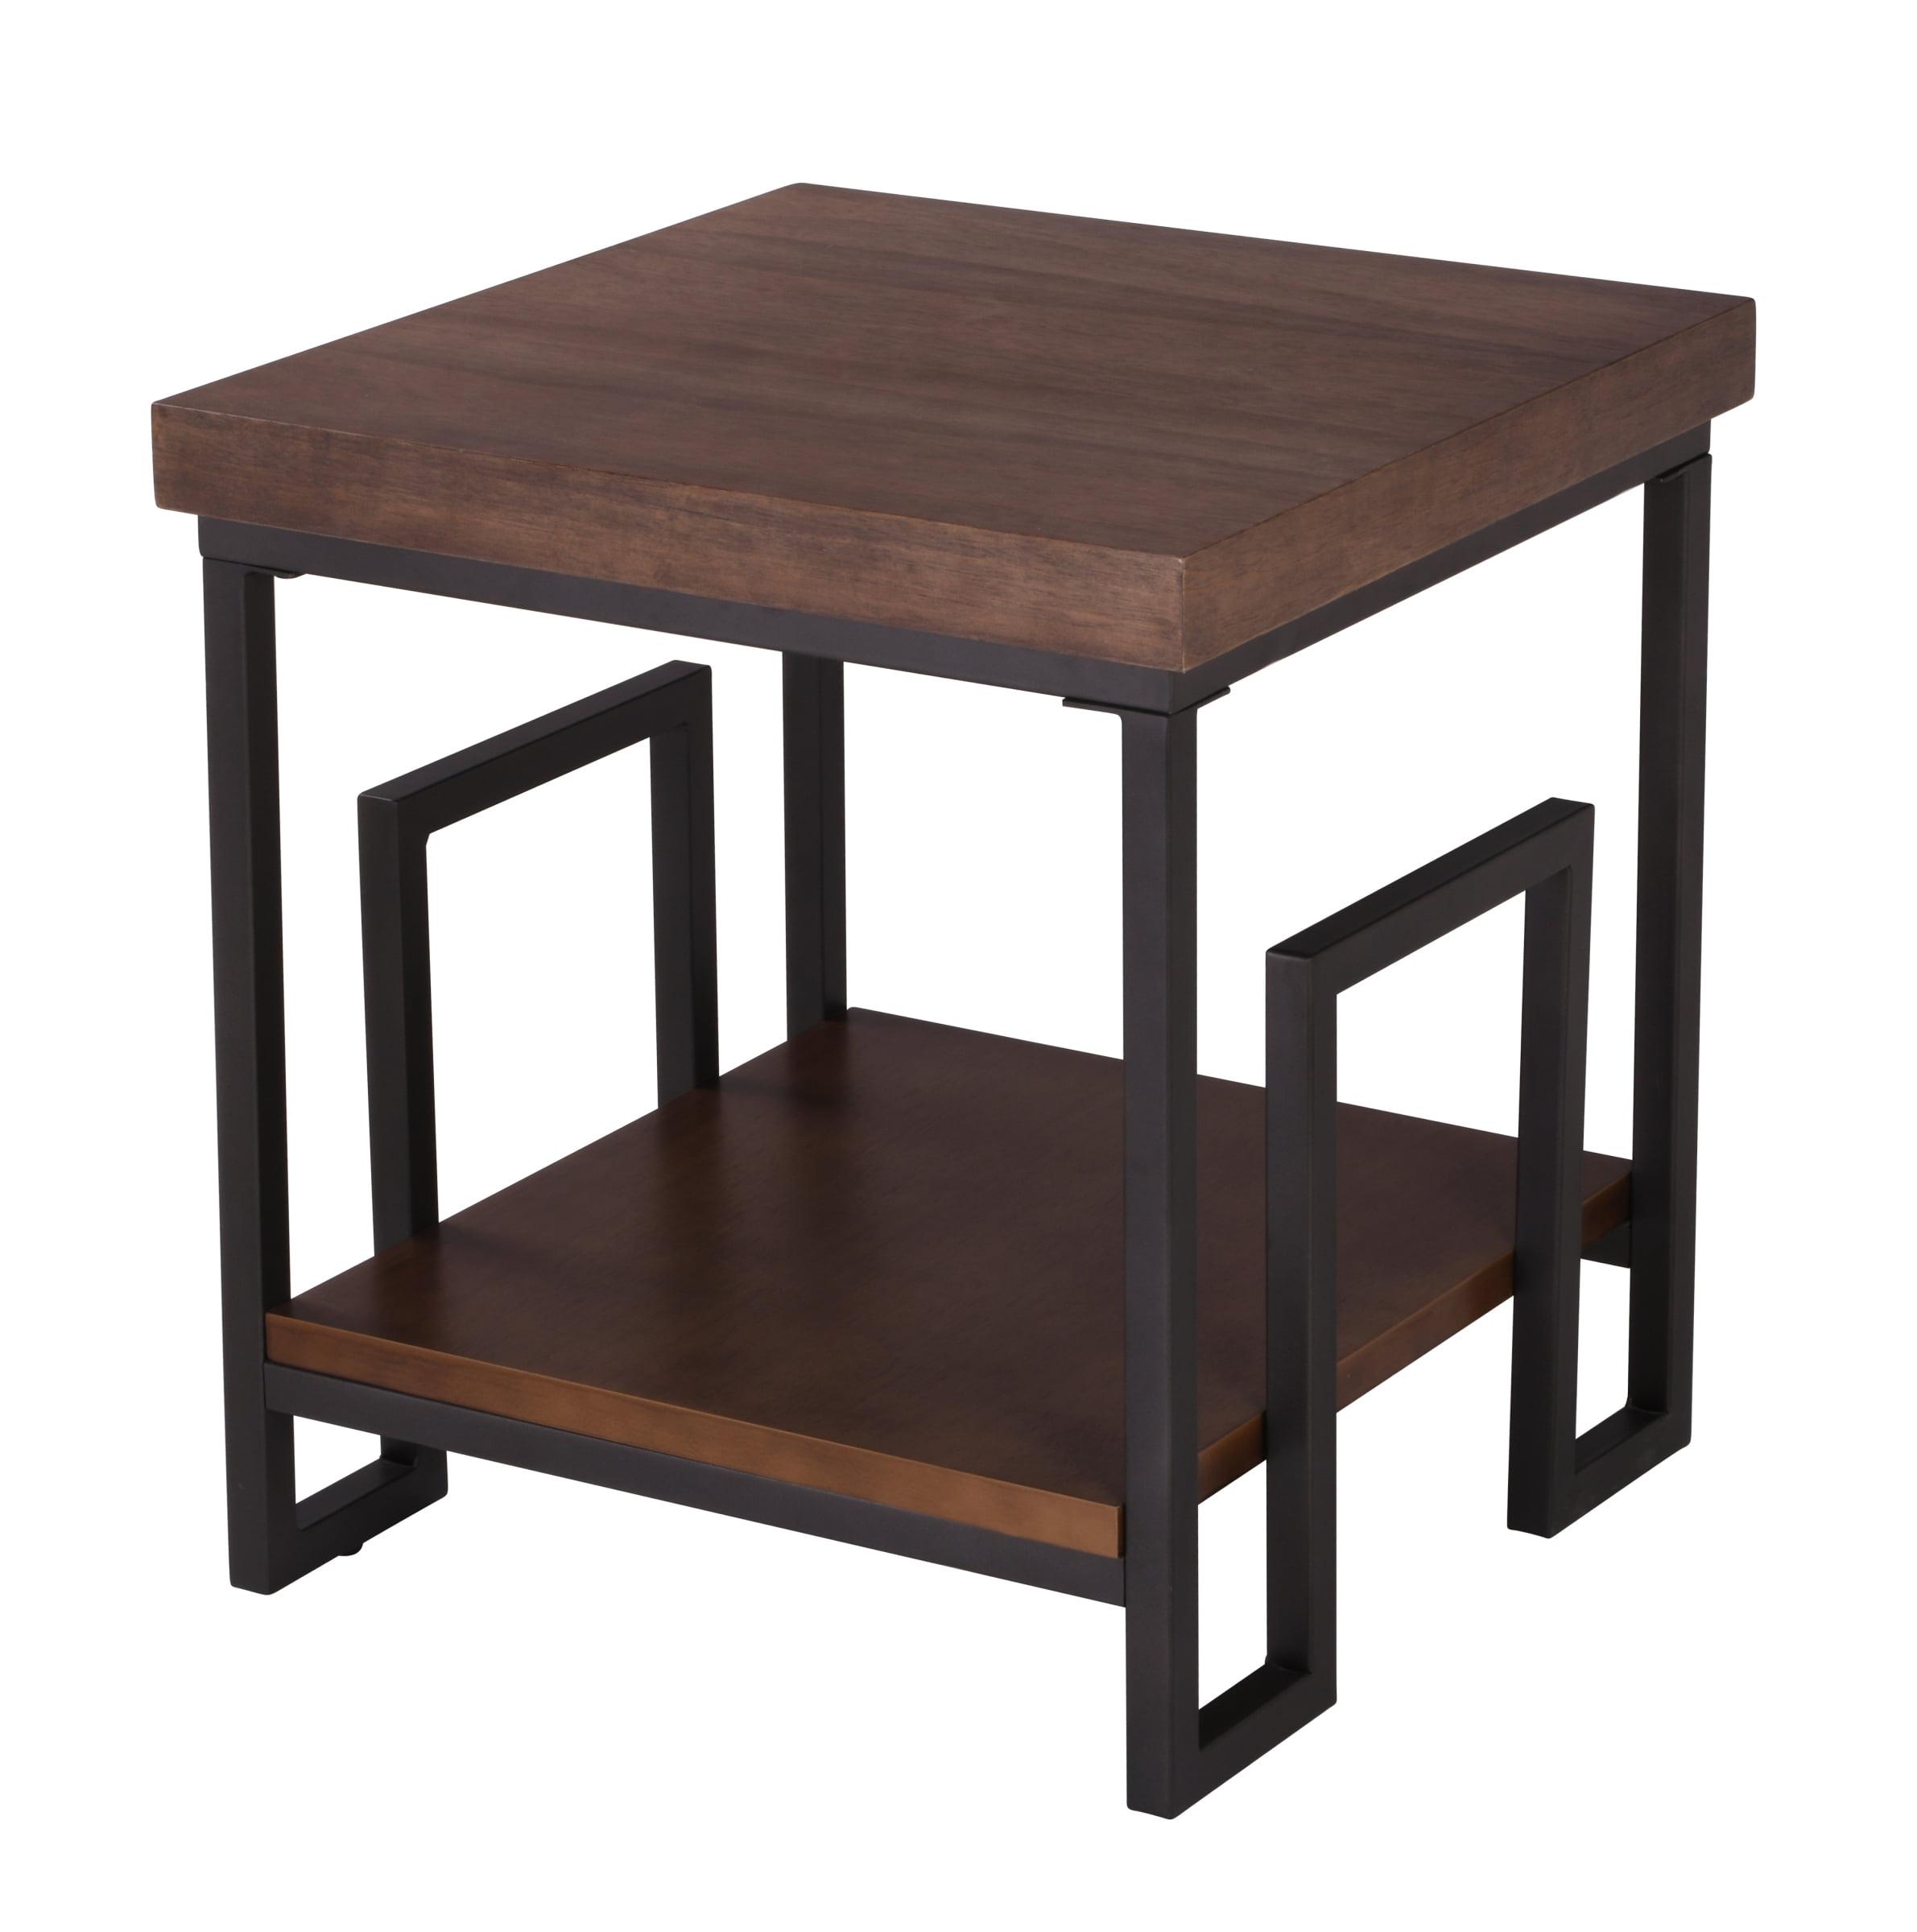 Better Homes & Gardens Elliot Square Side Table, Natural Wooden Finish